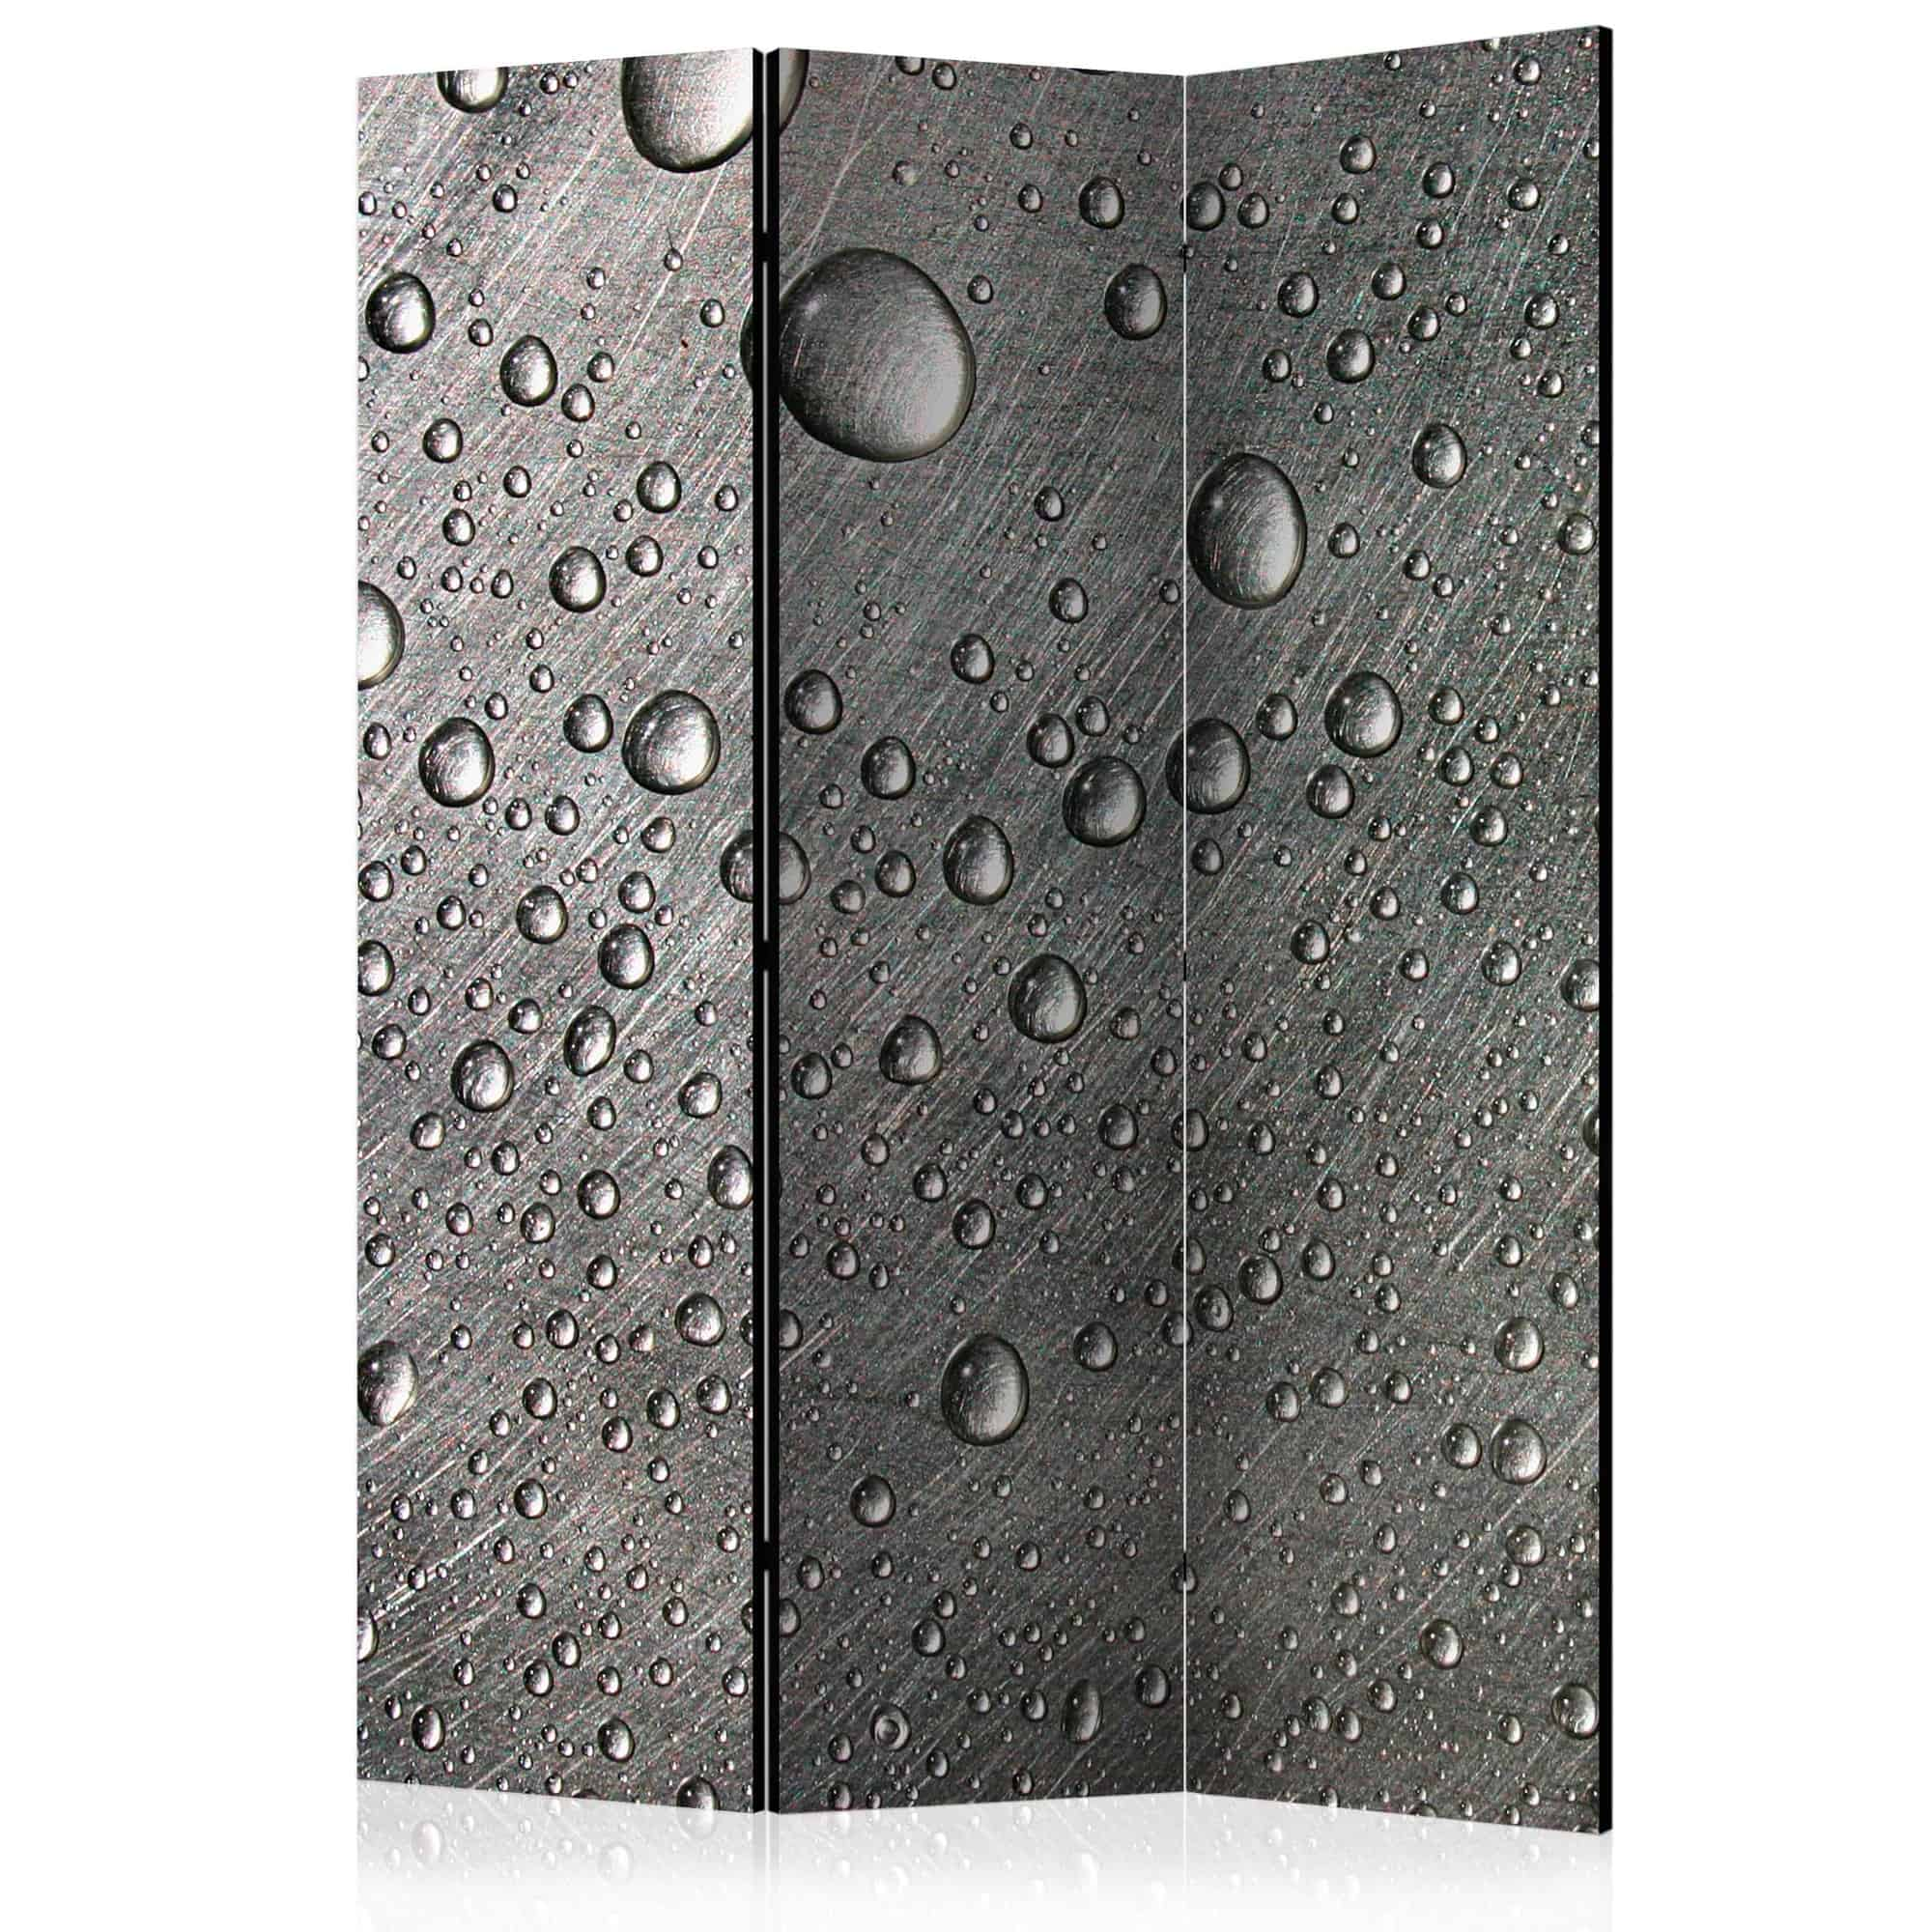 Skærmvæg Steel surface with water drops